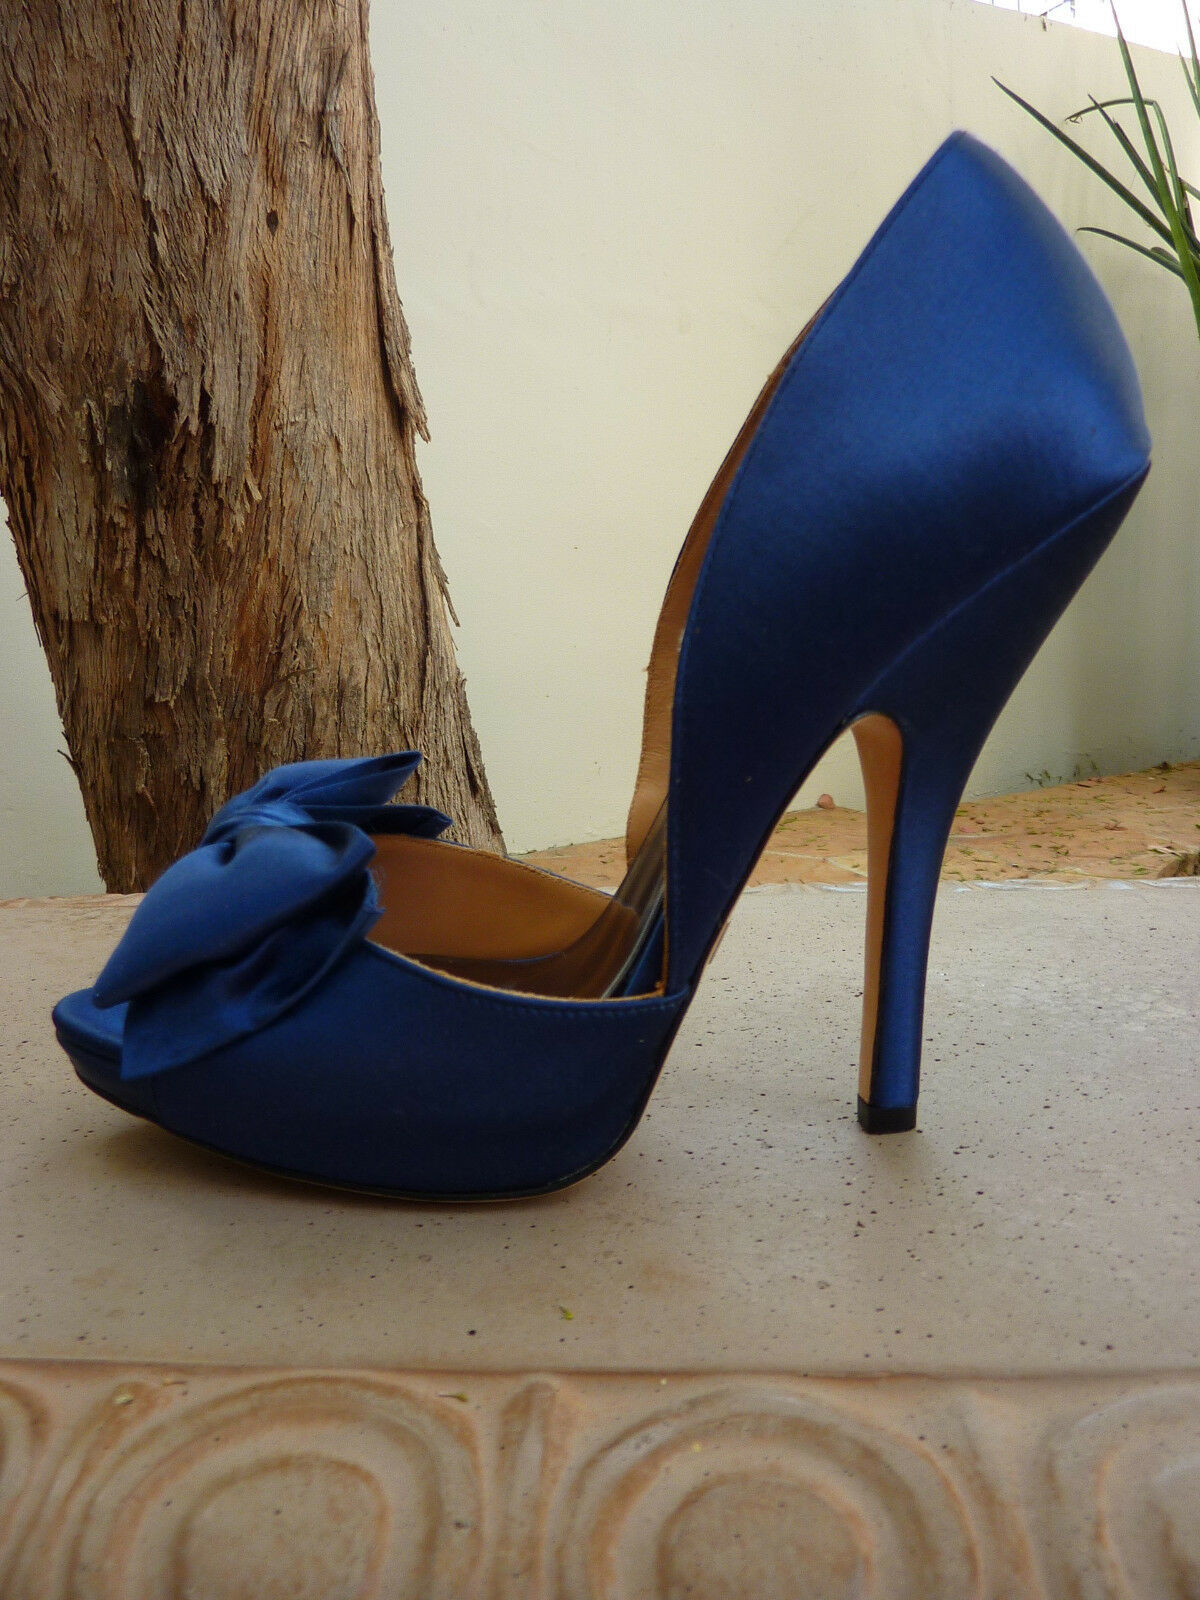 garanzia di qualità Badgley Mischka Stiletto Pumps Heels Heels Heels scarpe Vargas Girl Pin-up Vintage Style  costo effettivo